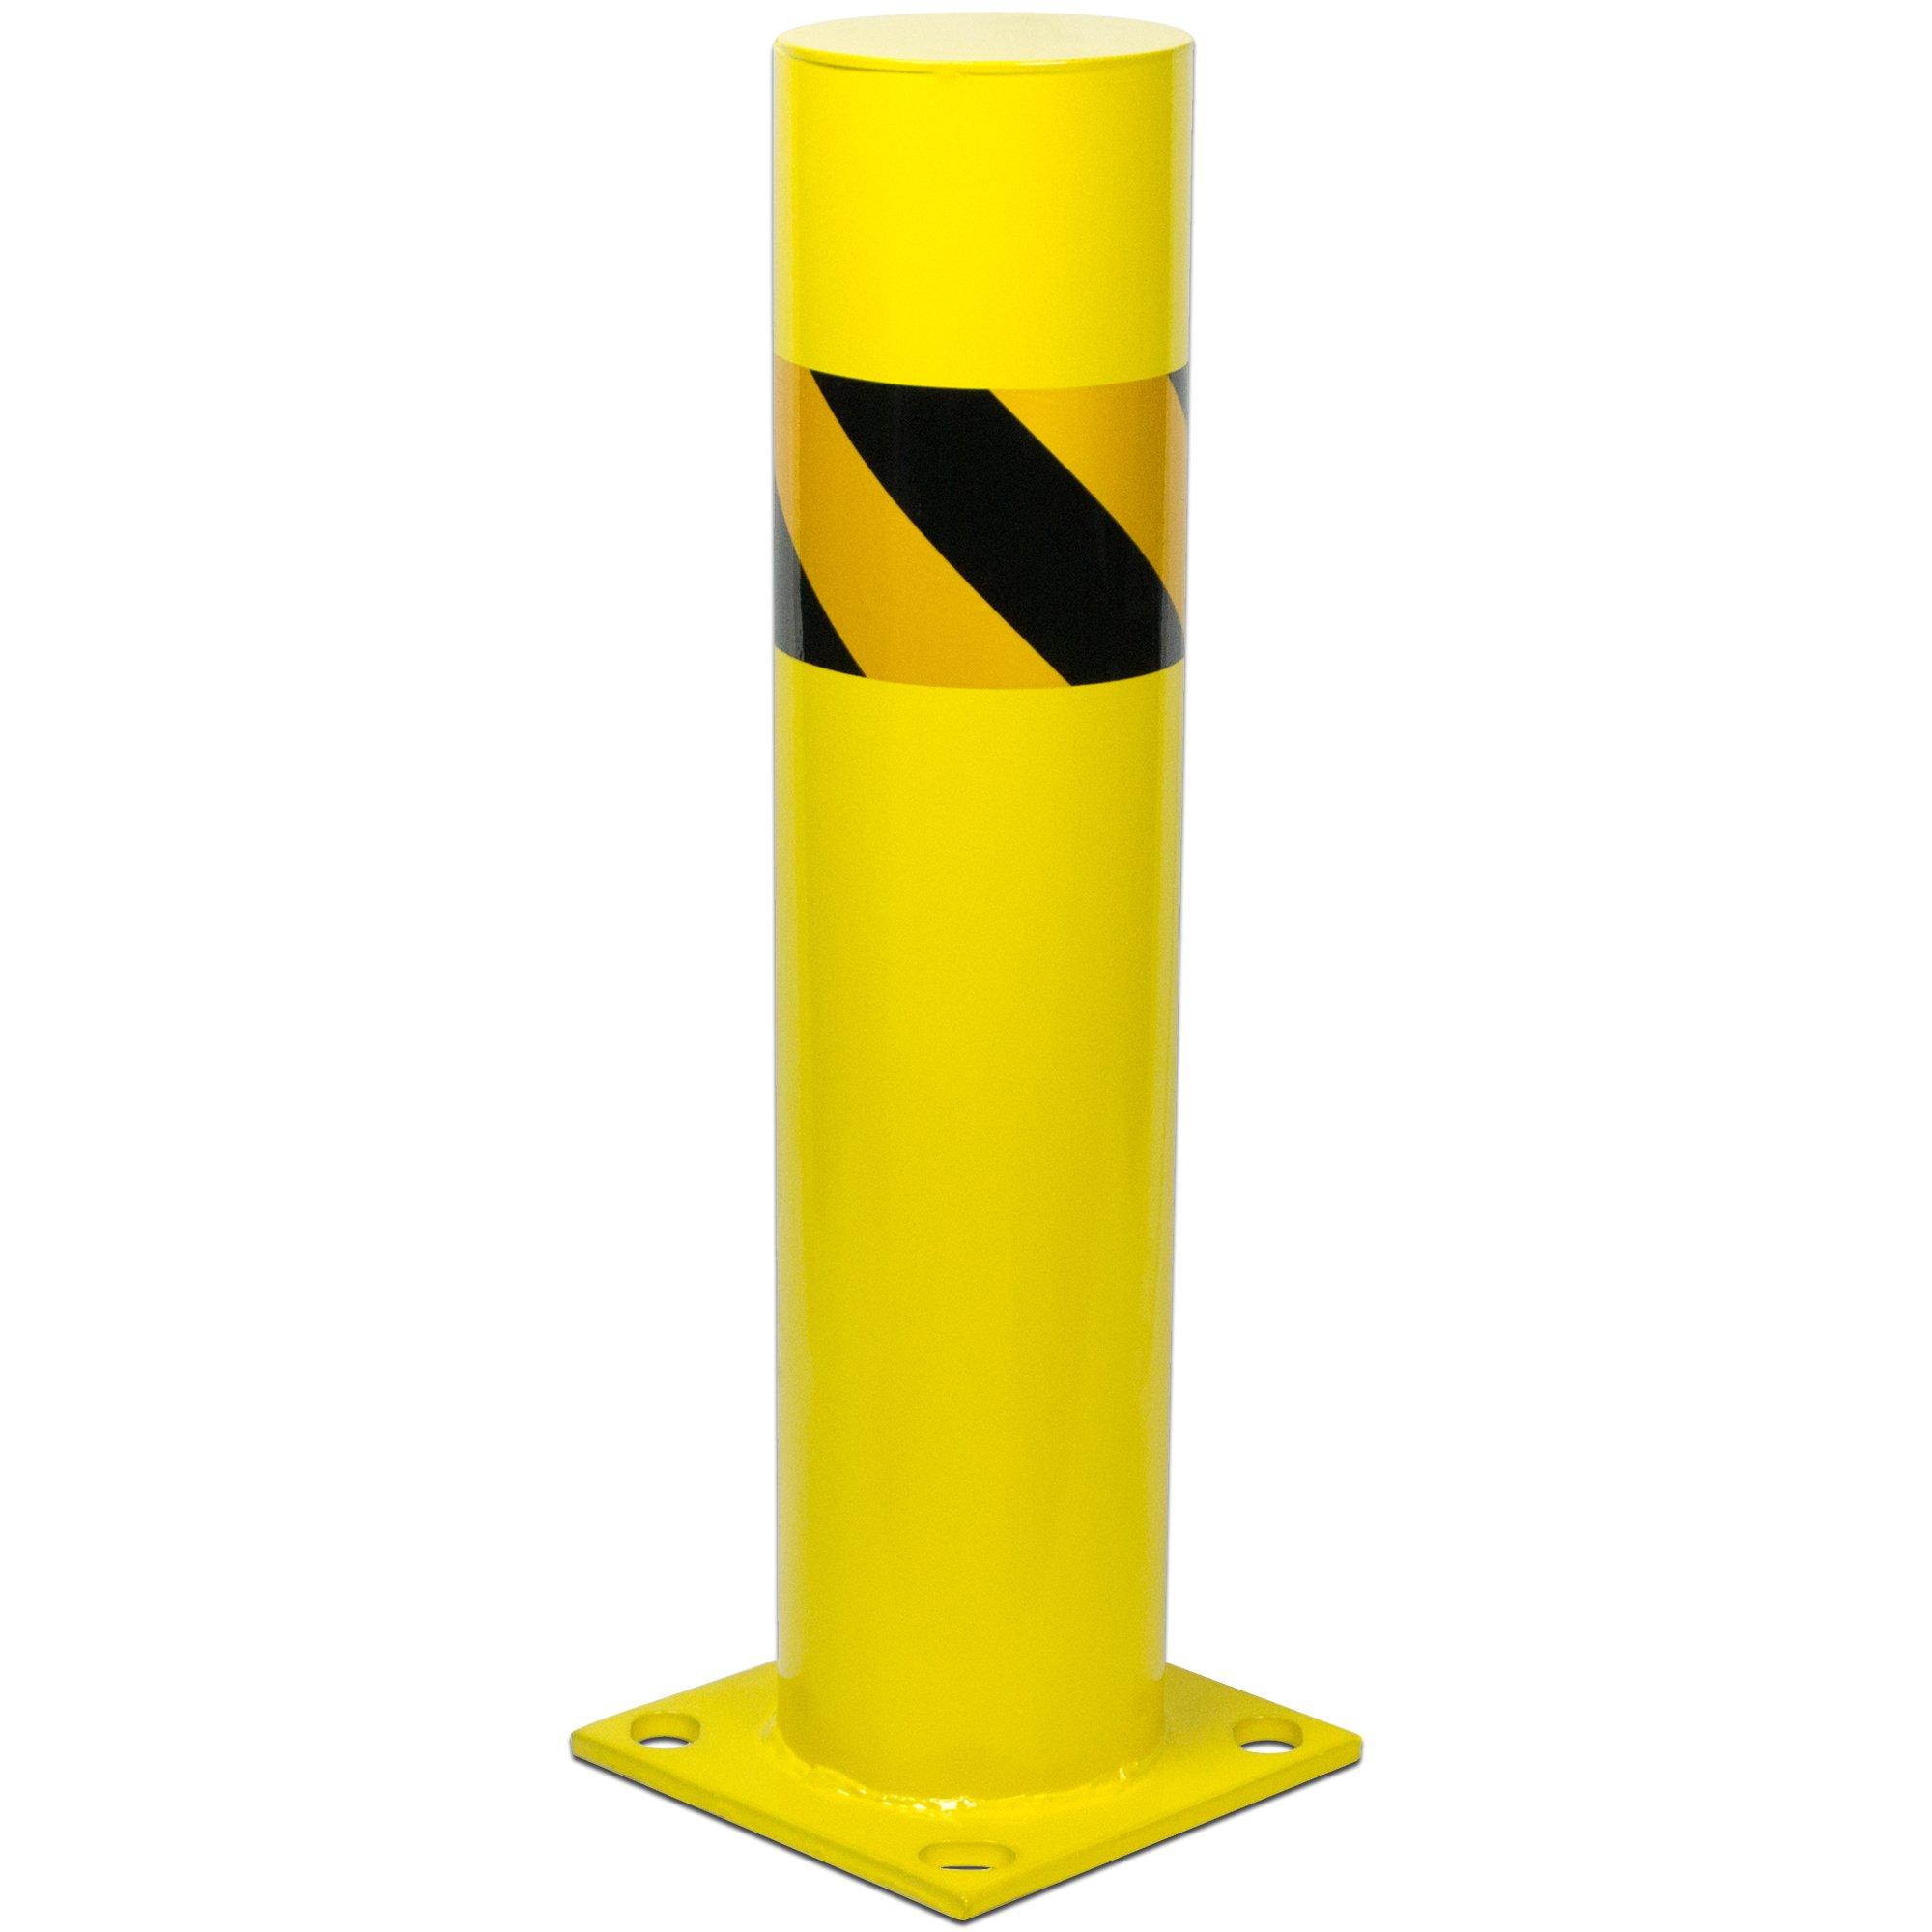 Bollard Post - Steel Safety Barrier Protection- Yellow Powder Coat 5.5'' Diameter 24'' Tall BW5524